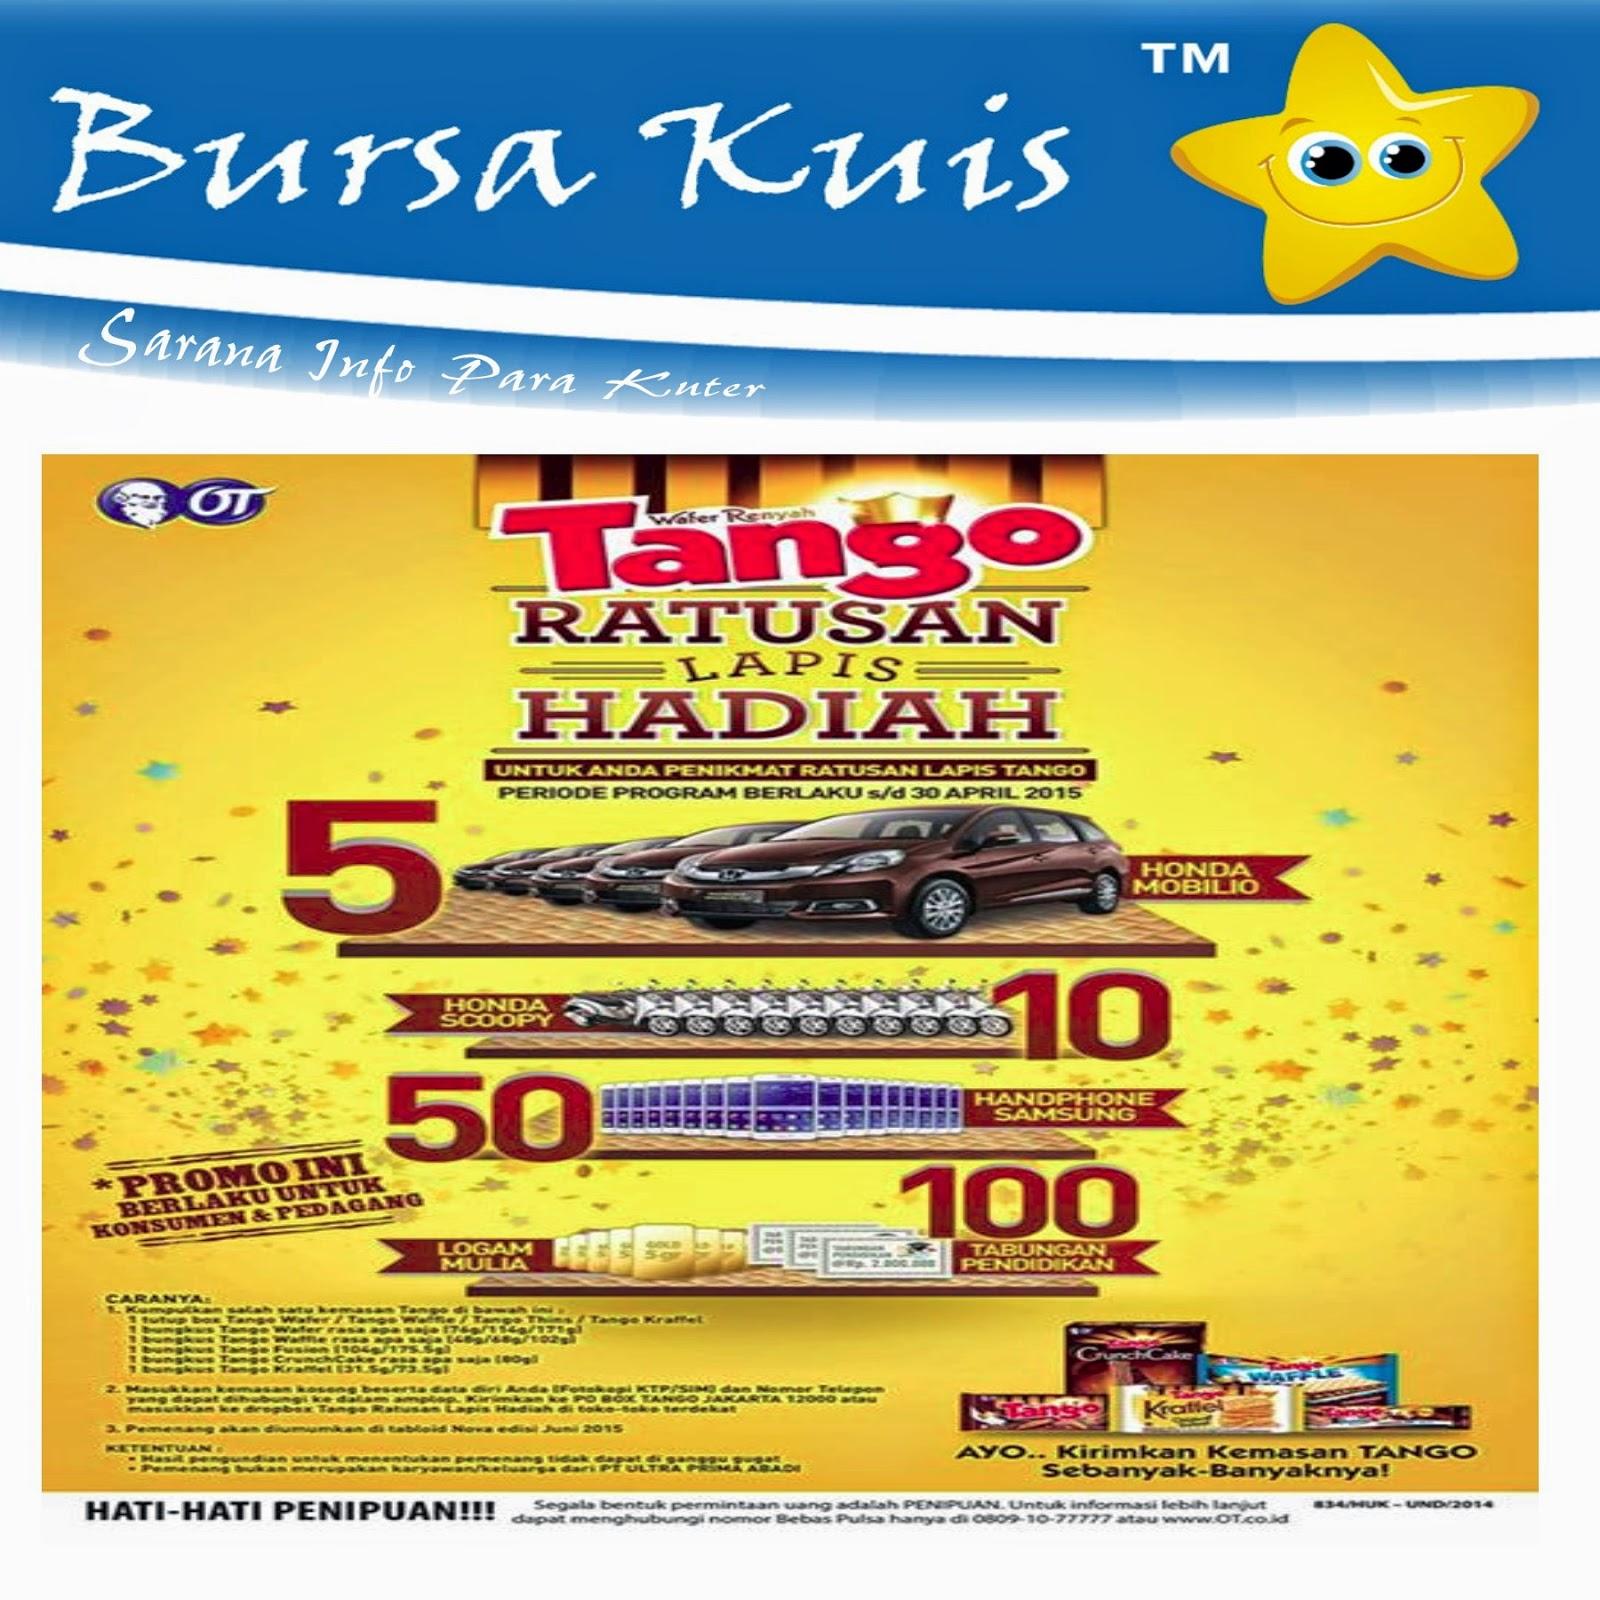 Harga Jual Wafer Tango Waffle Crunchox Pck 68g Tanggo Undian Ratusan Lapis Hadiah 2015